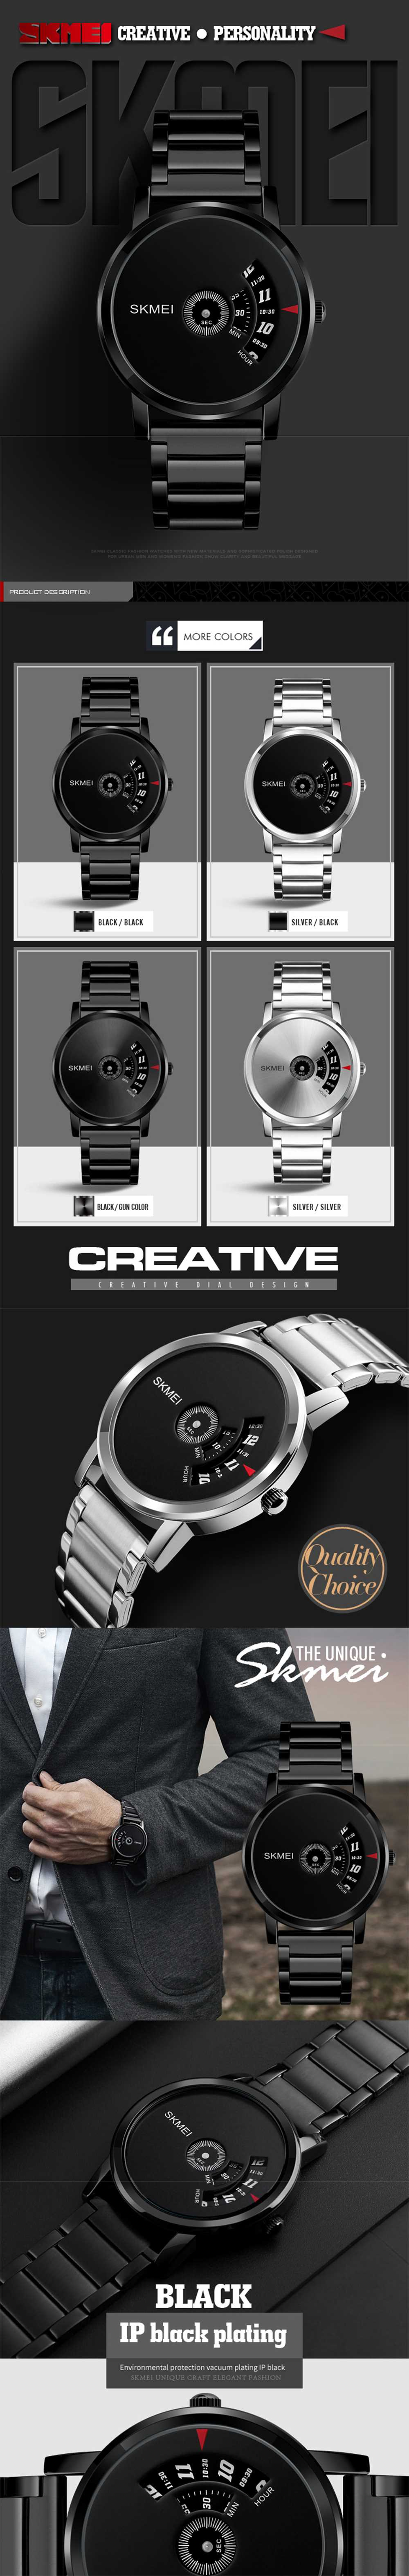 SKMEI Men's Quartz Waterproof Full Steel Fashion Top Luxury Brand Watches